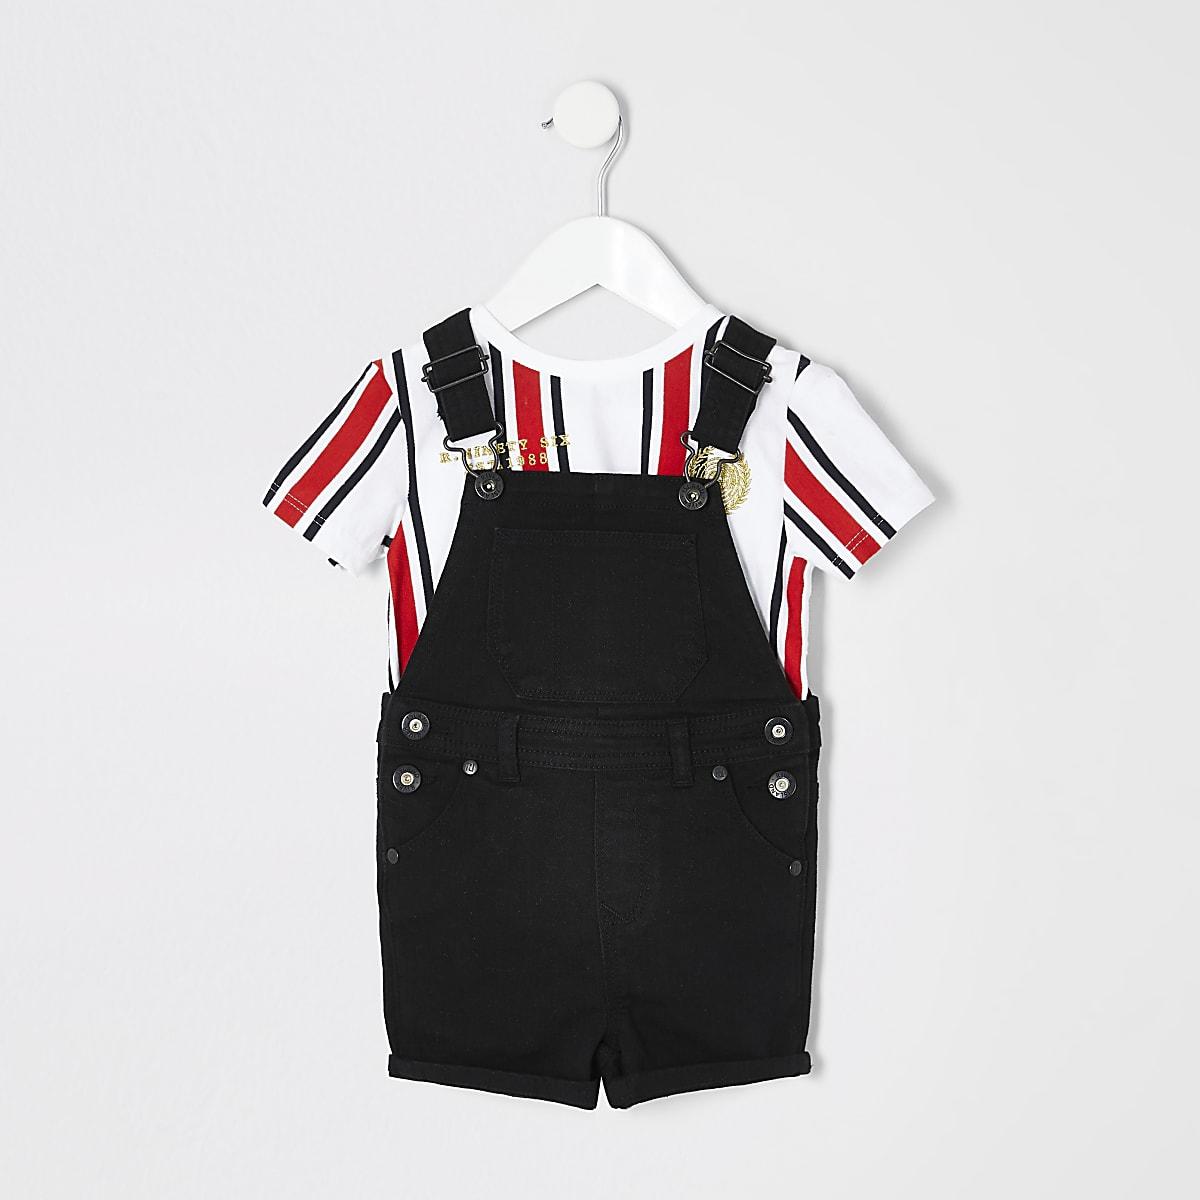 Mini boys black denim short overalls outfit